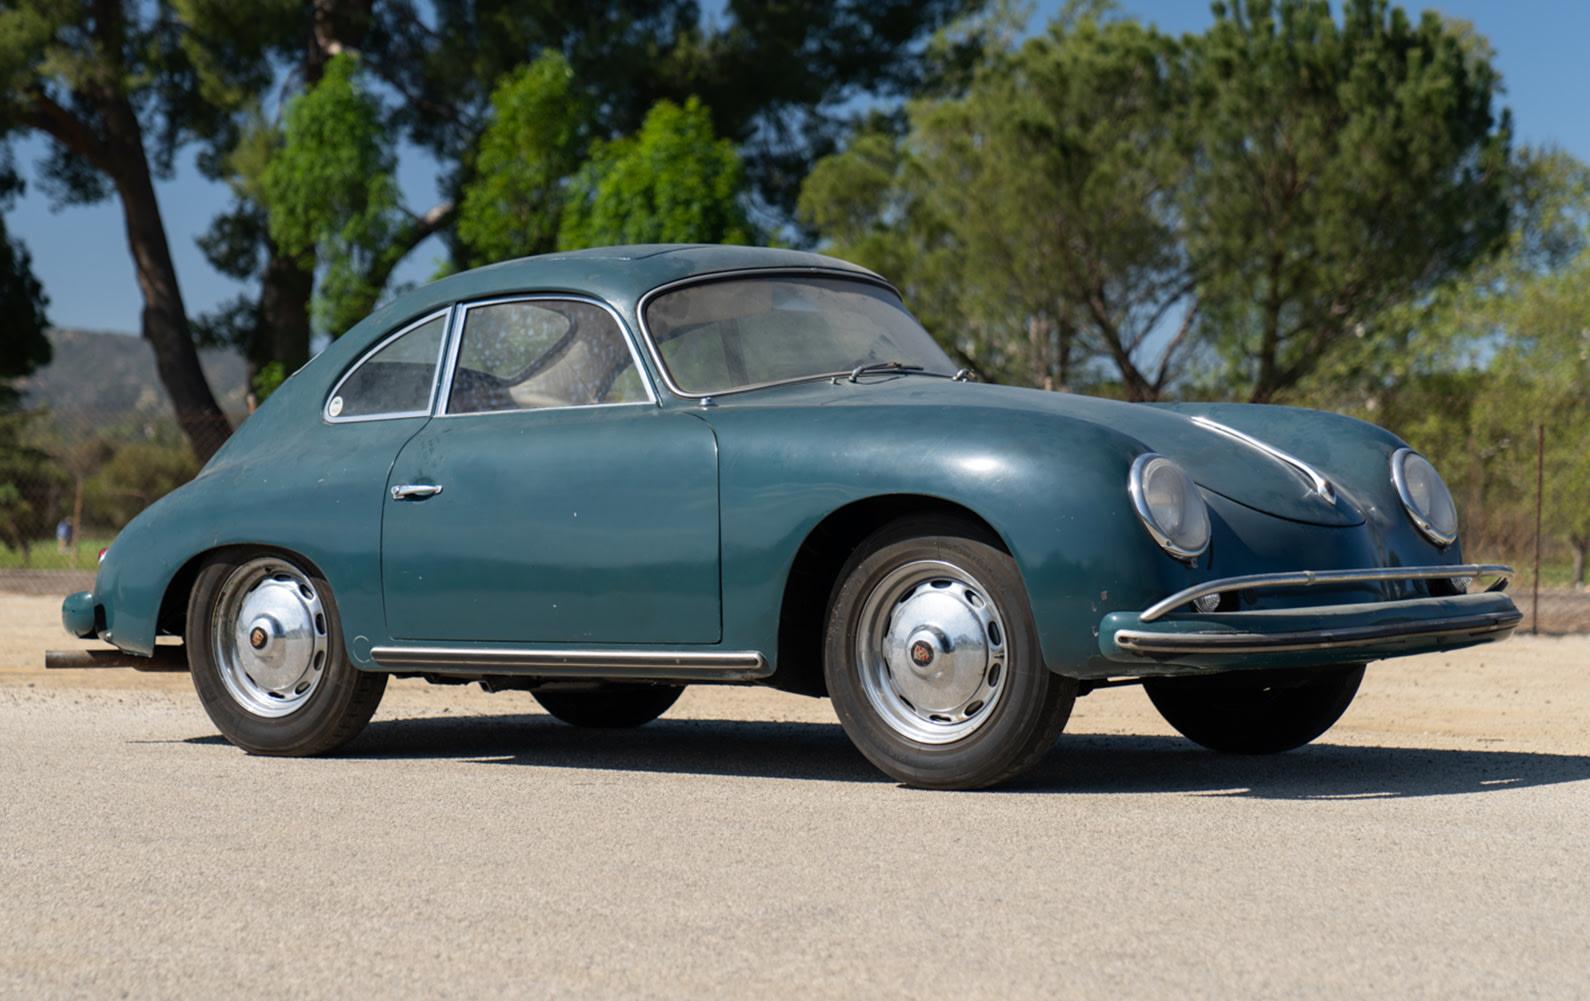 Prod/O21F - May 2021/1481_1957 Porsche 356 A Coupe/1957_Porsche_356A_Coupe-1_JPEG_Press_lkjuf2